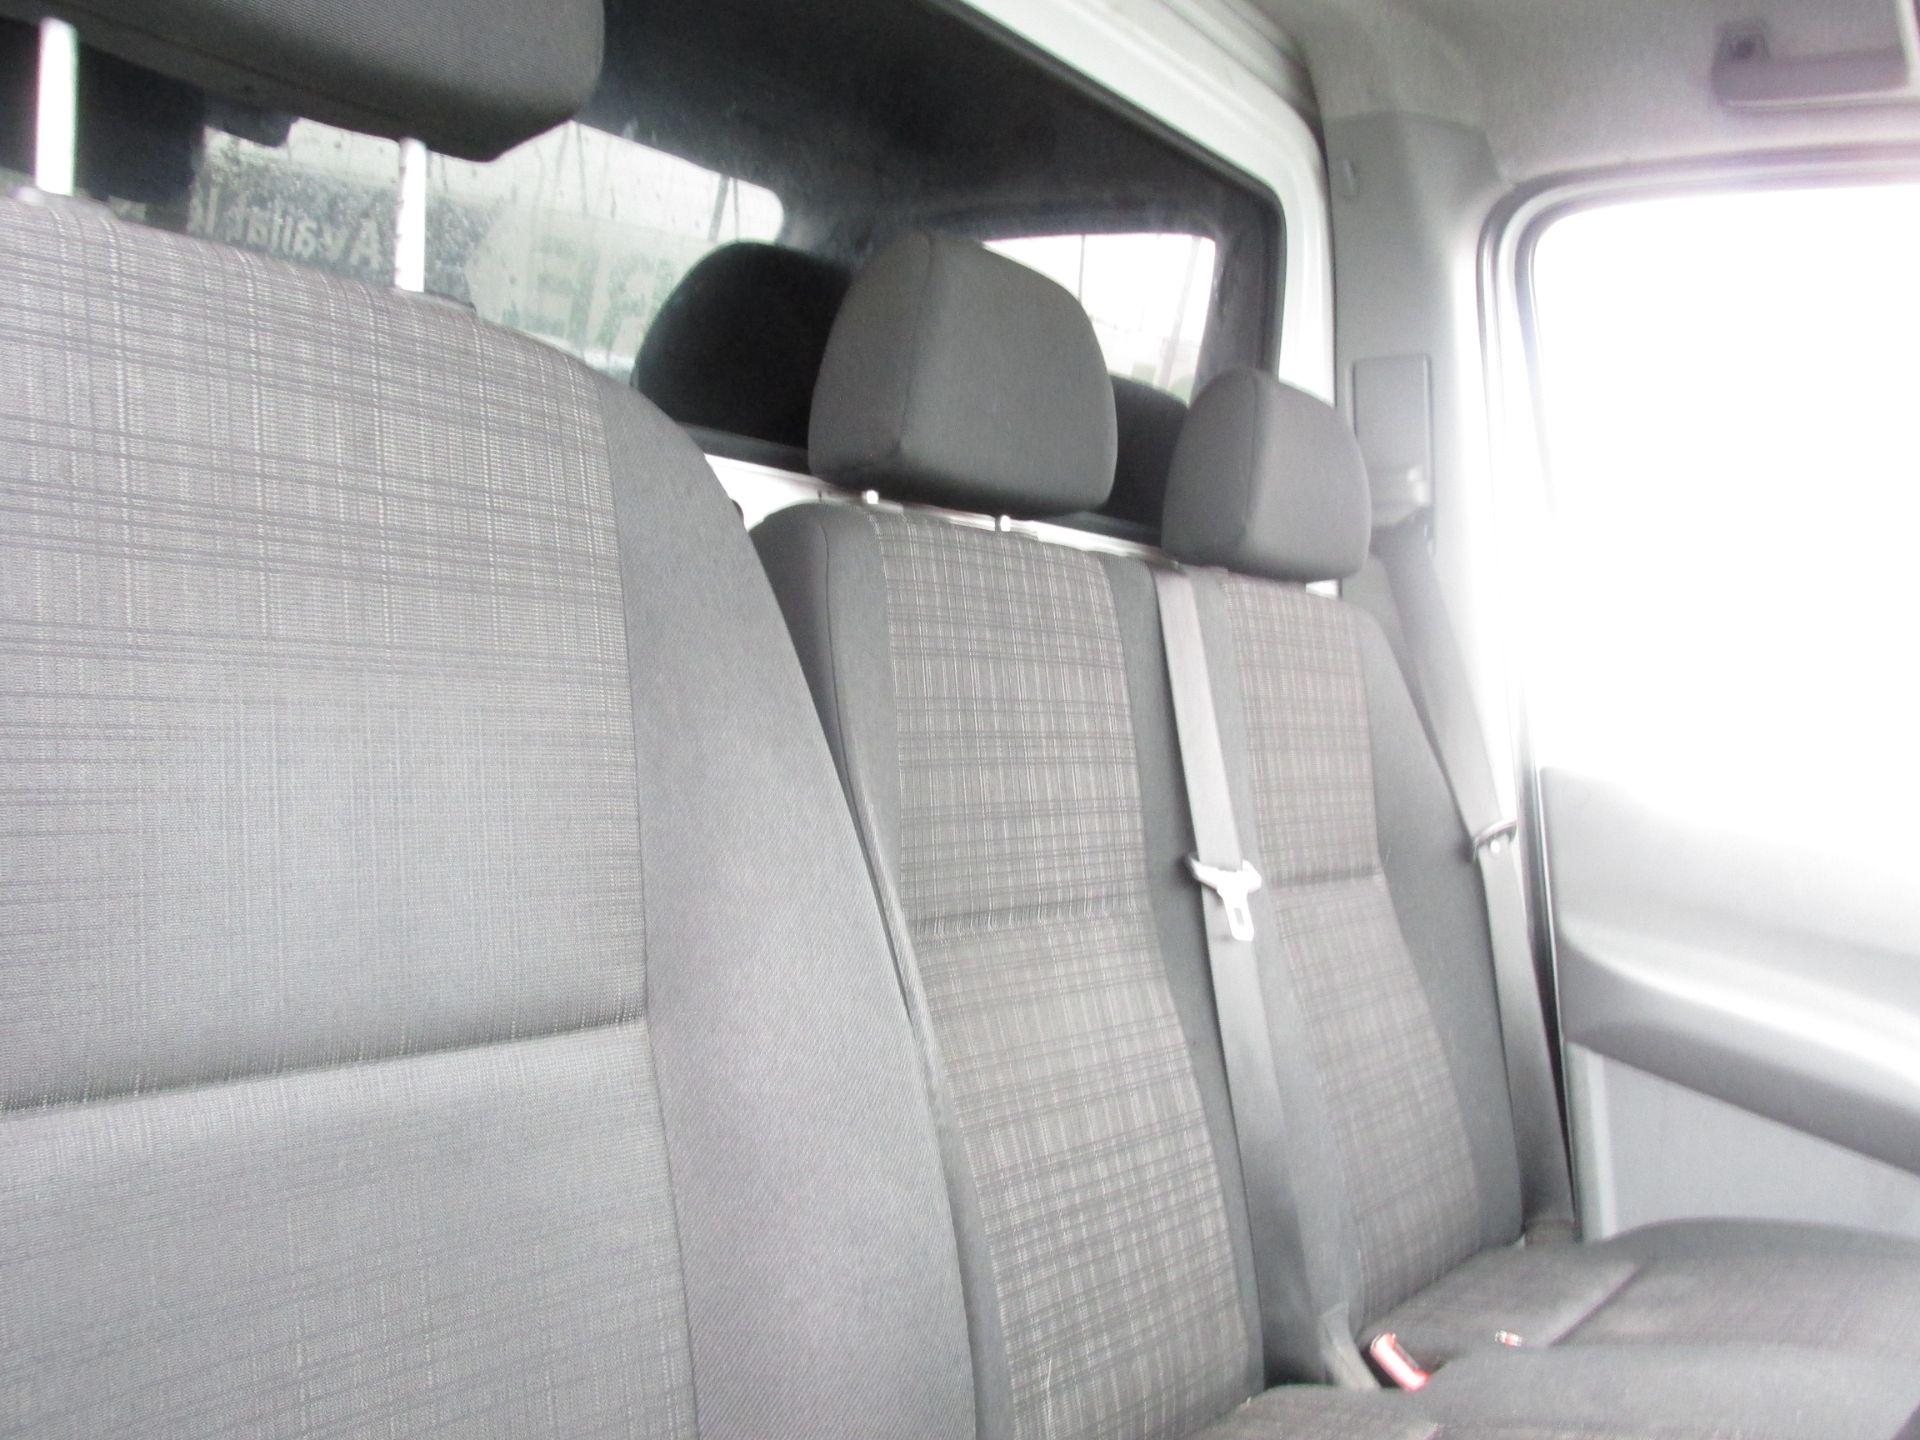 2015 Mercedes-Benz Sprinter 313 CDI - Luton Box & Tail Lift - (152D10142) Image 9